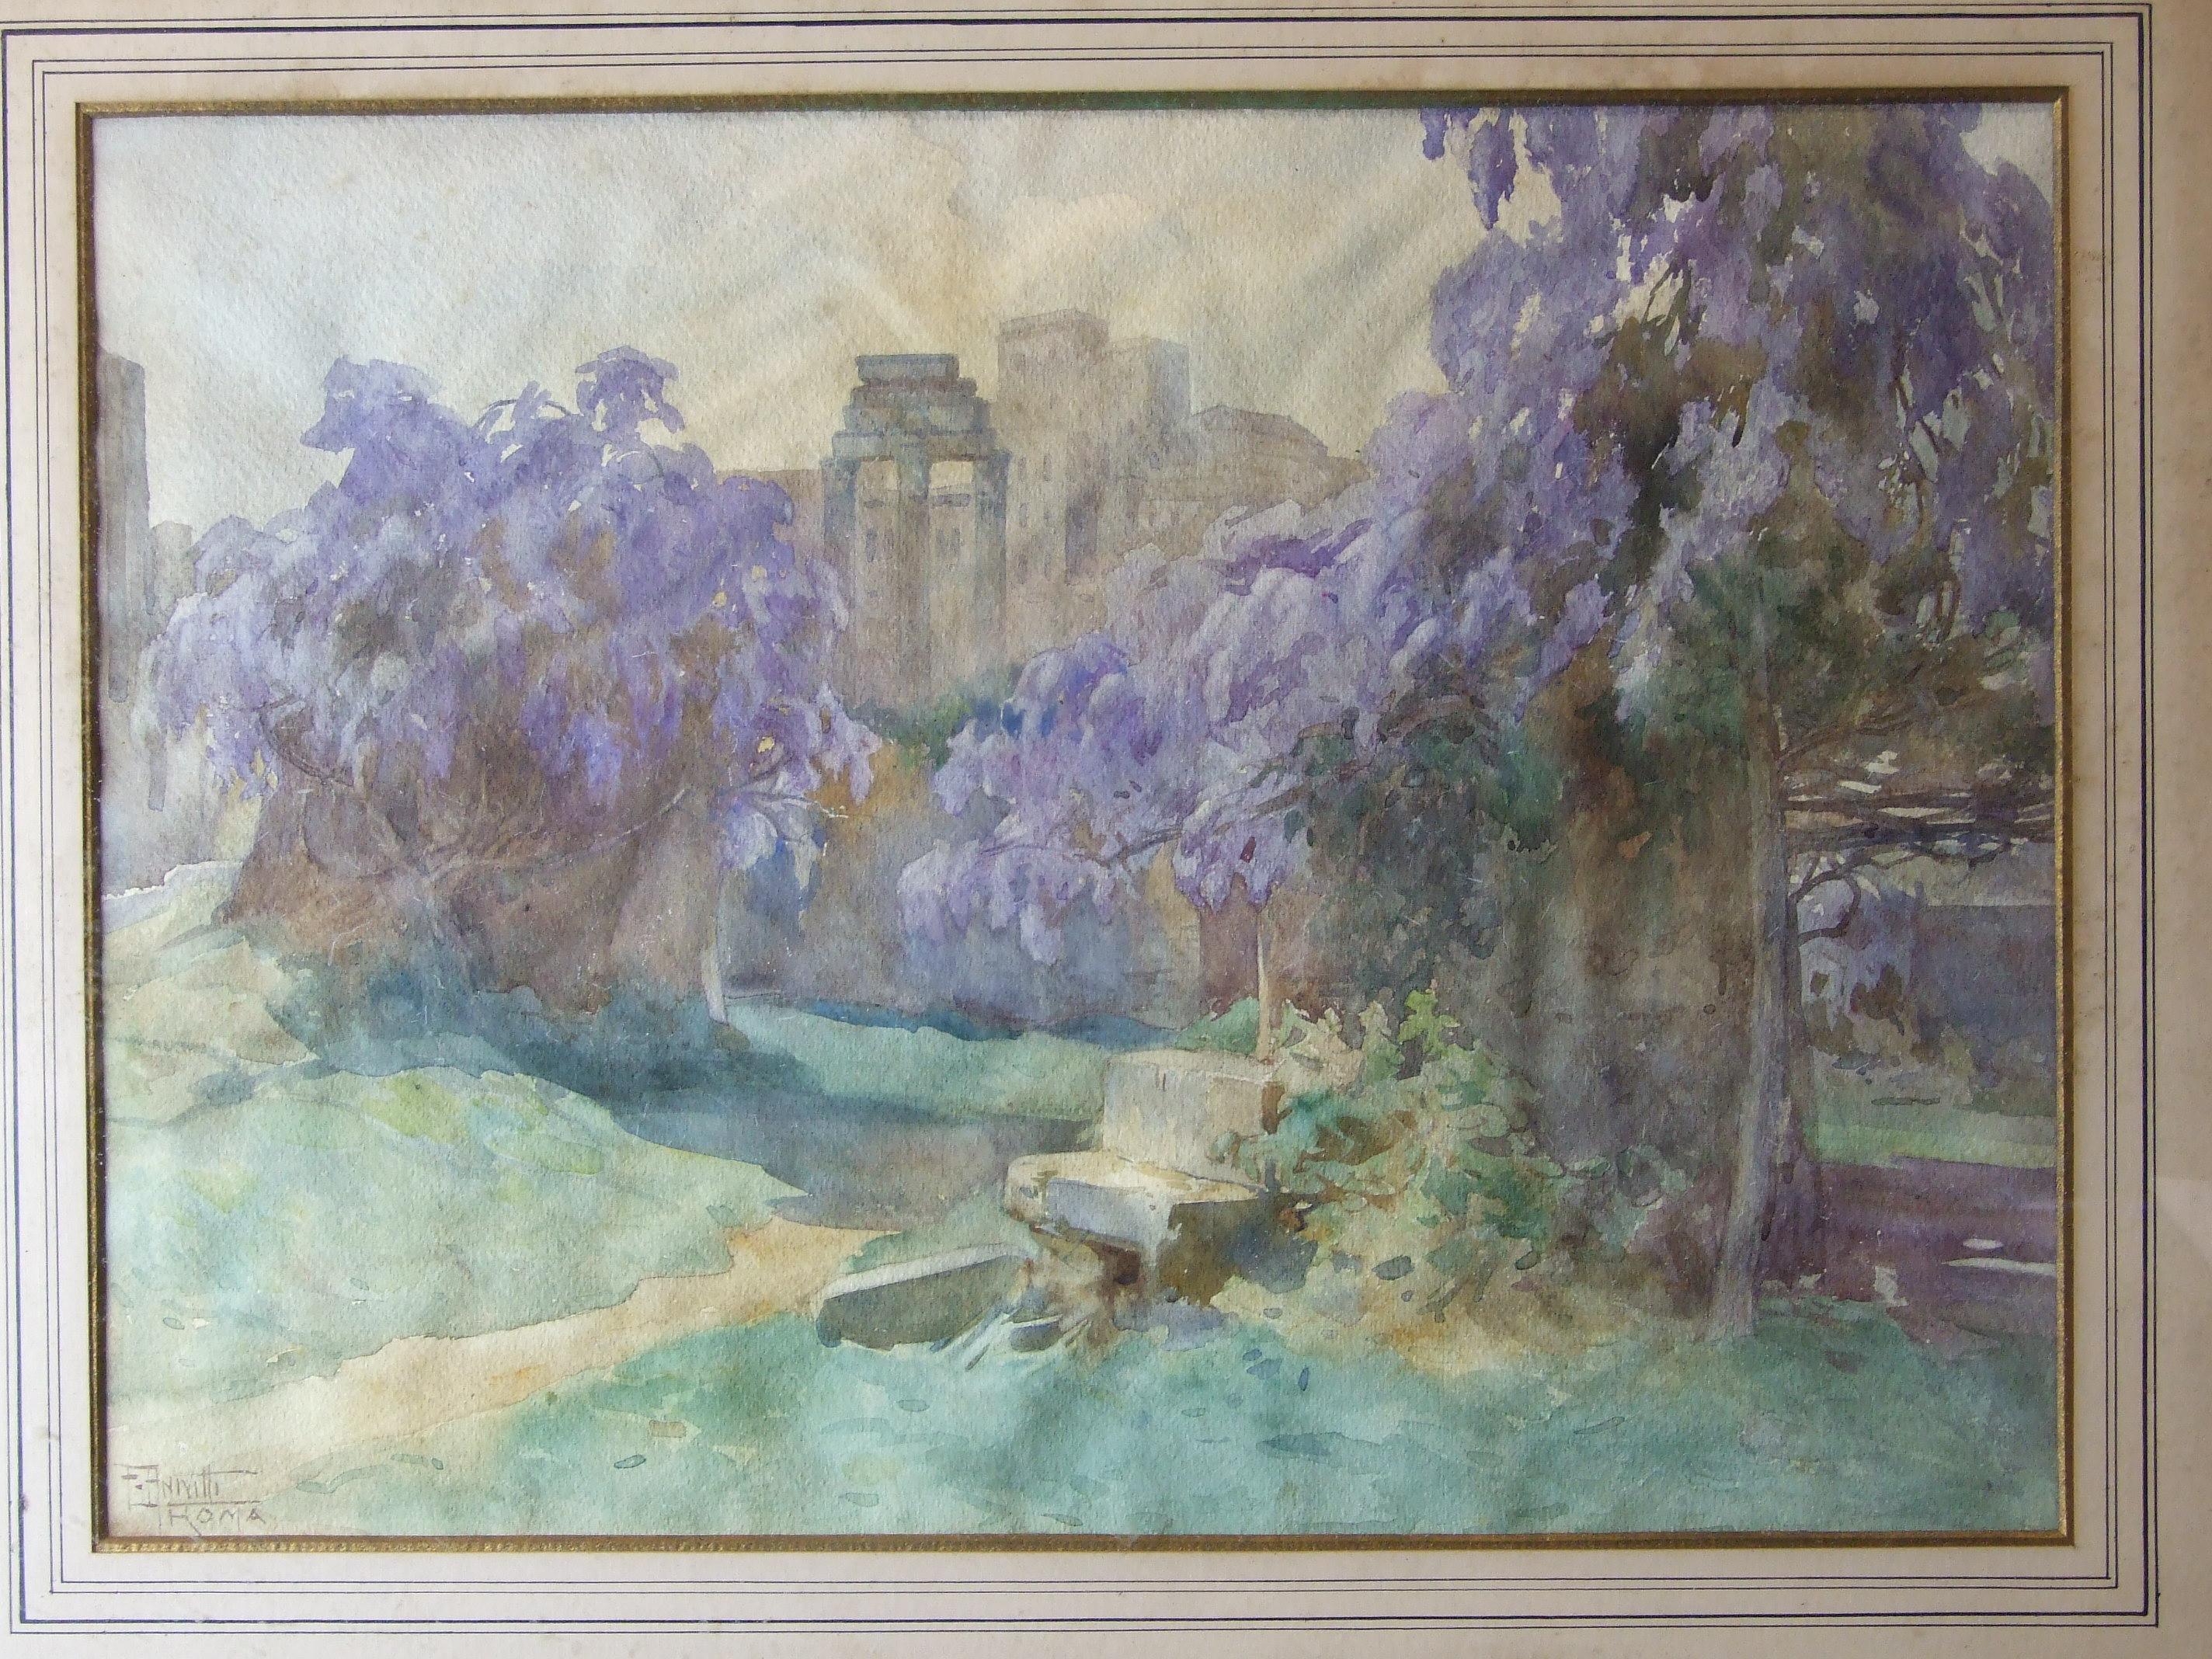 Lot 36 - Filippo Anivitti (1876-1955) ROMA Signed and titled watercolour, 36.5 x 50cm.